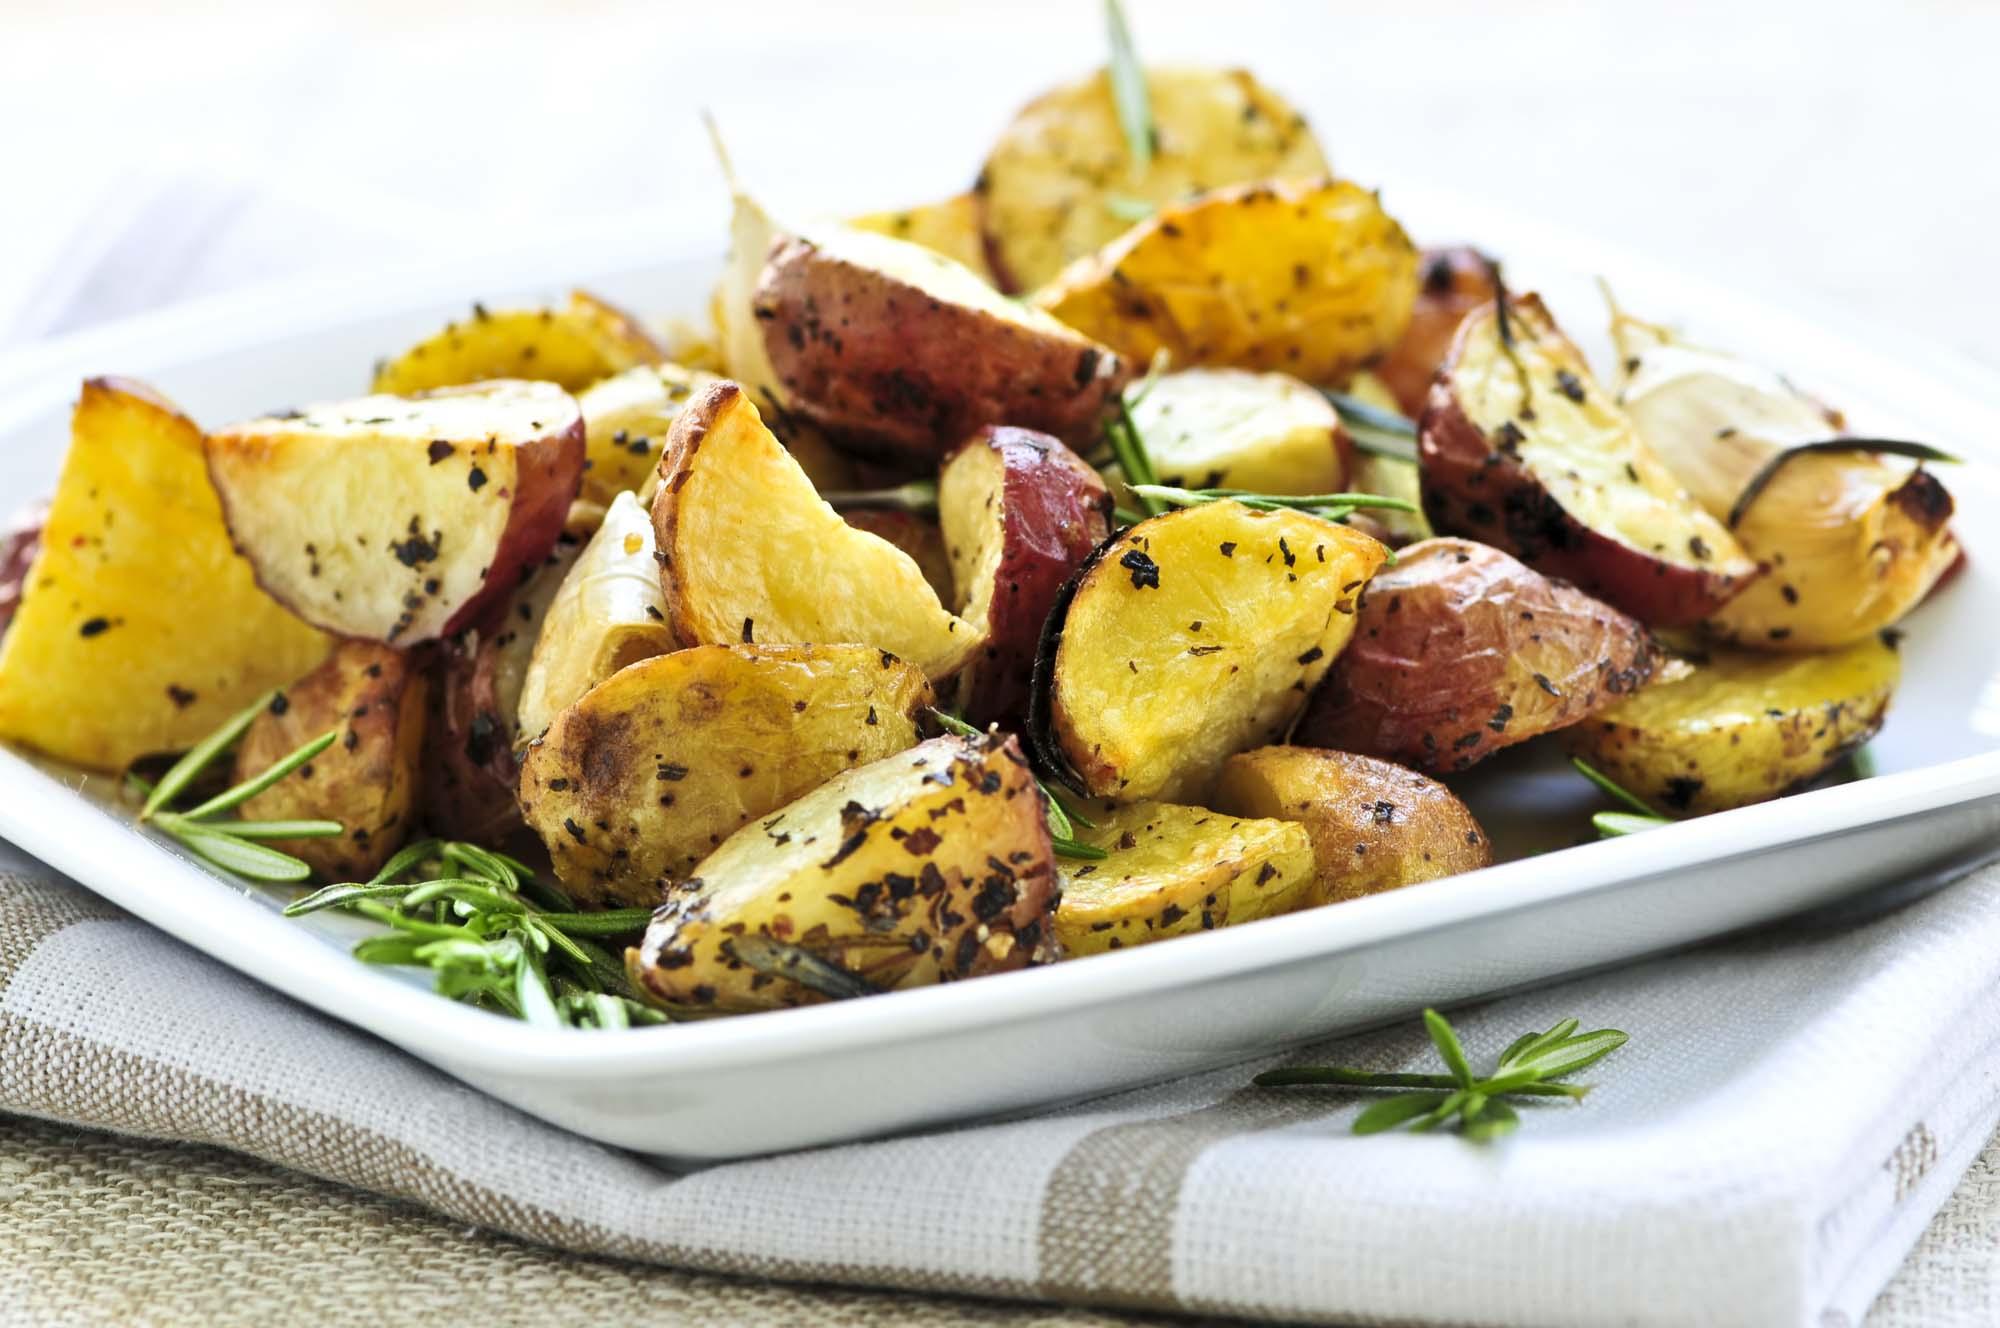 Balsamico bagte kartoffler